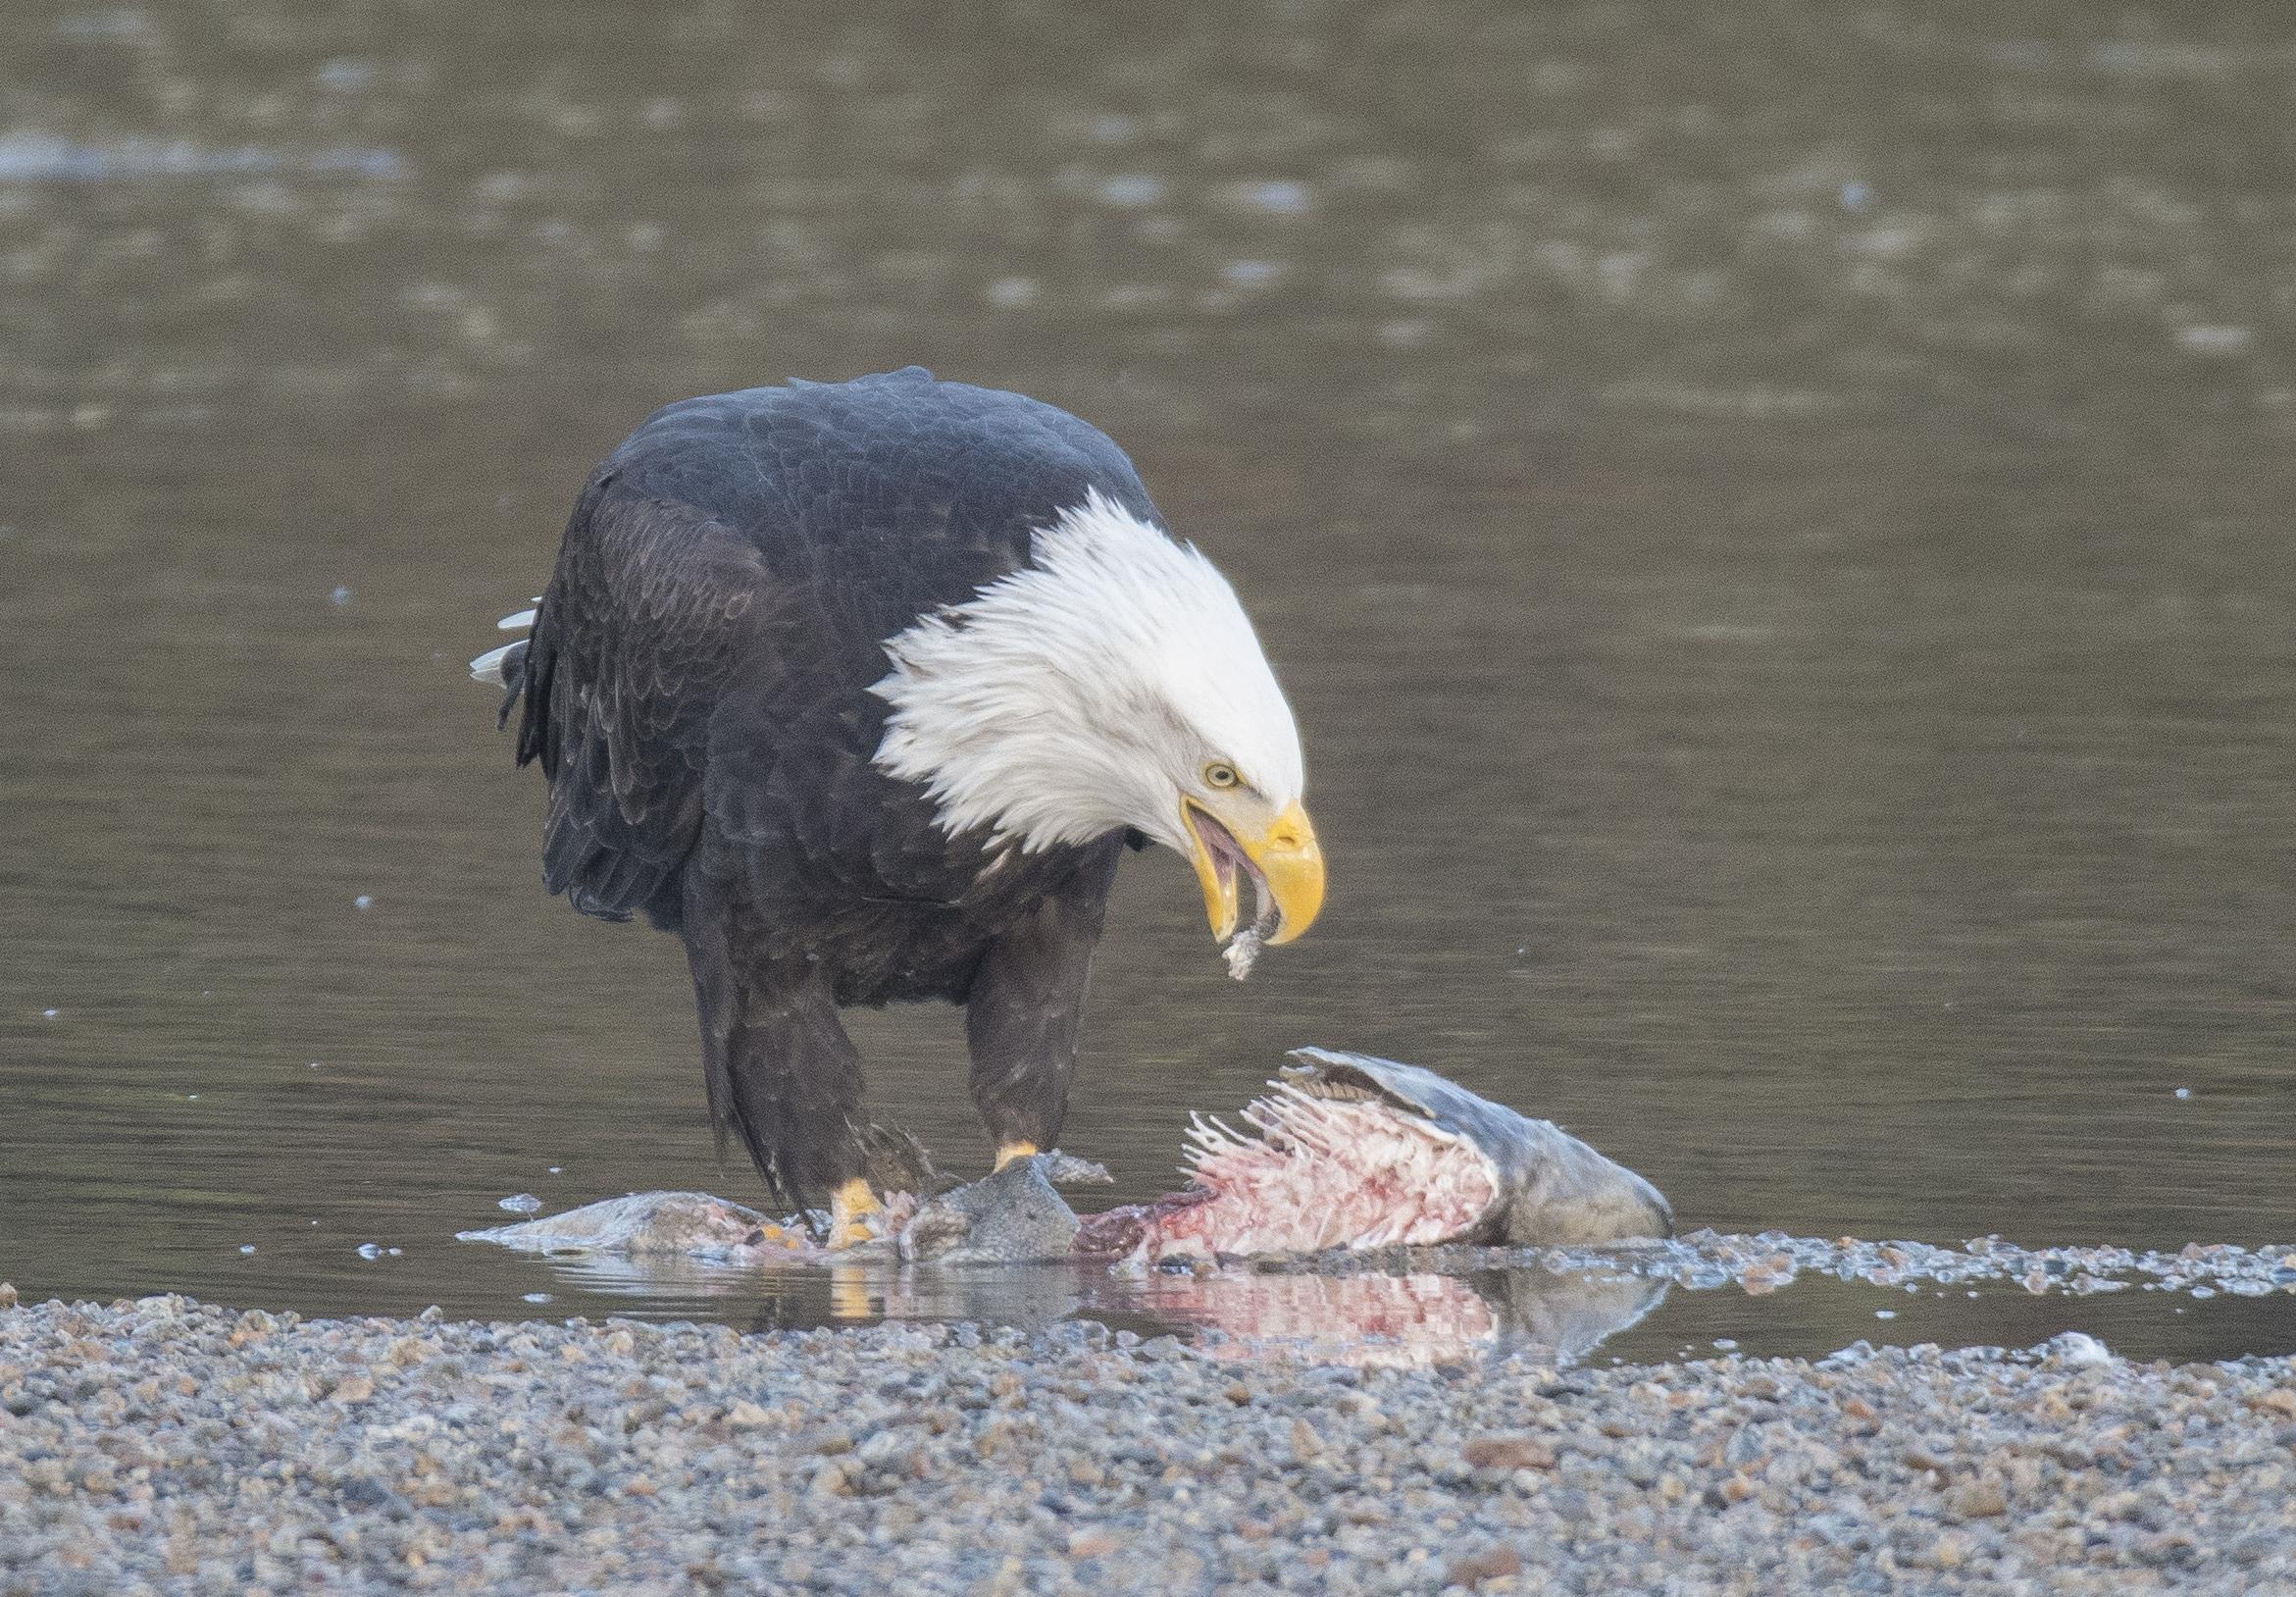 eagle eating a salmon.jpg